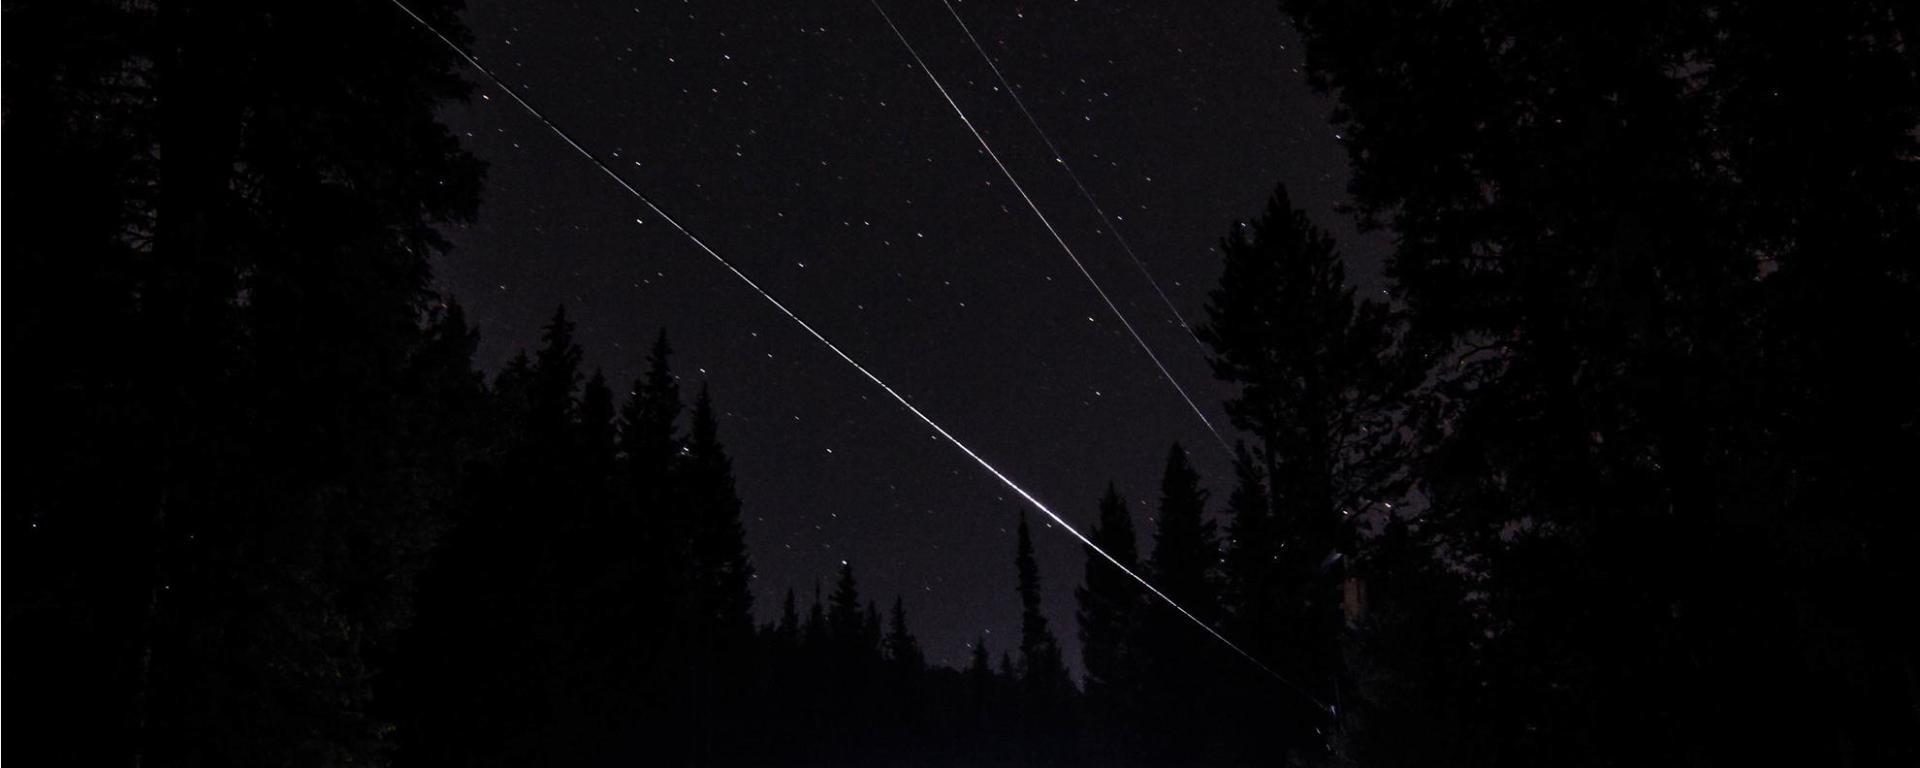 Shooting Star, Starry night